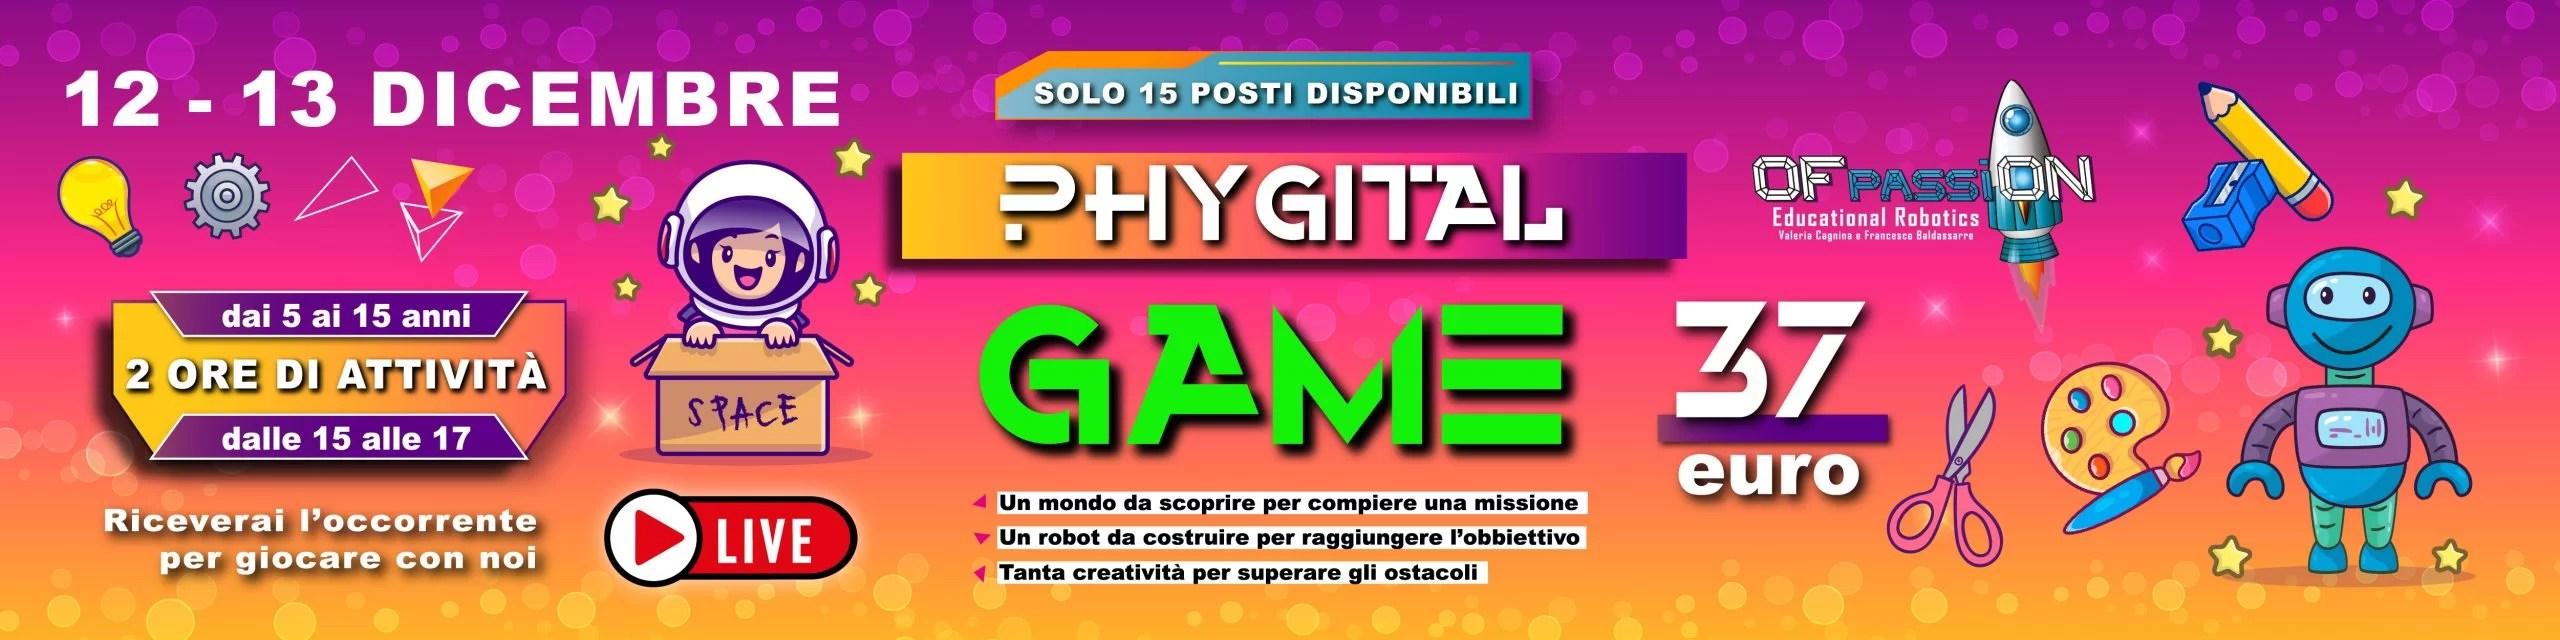 phygital weekend game